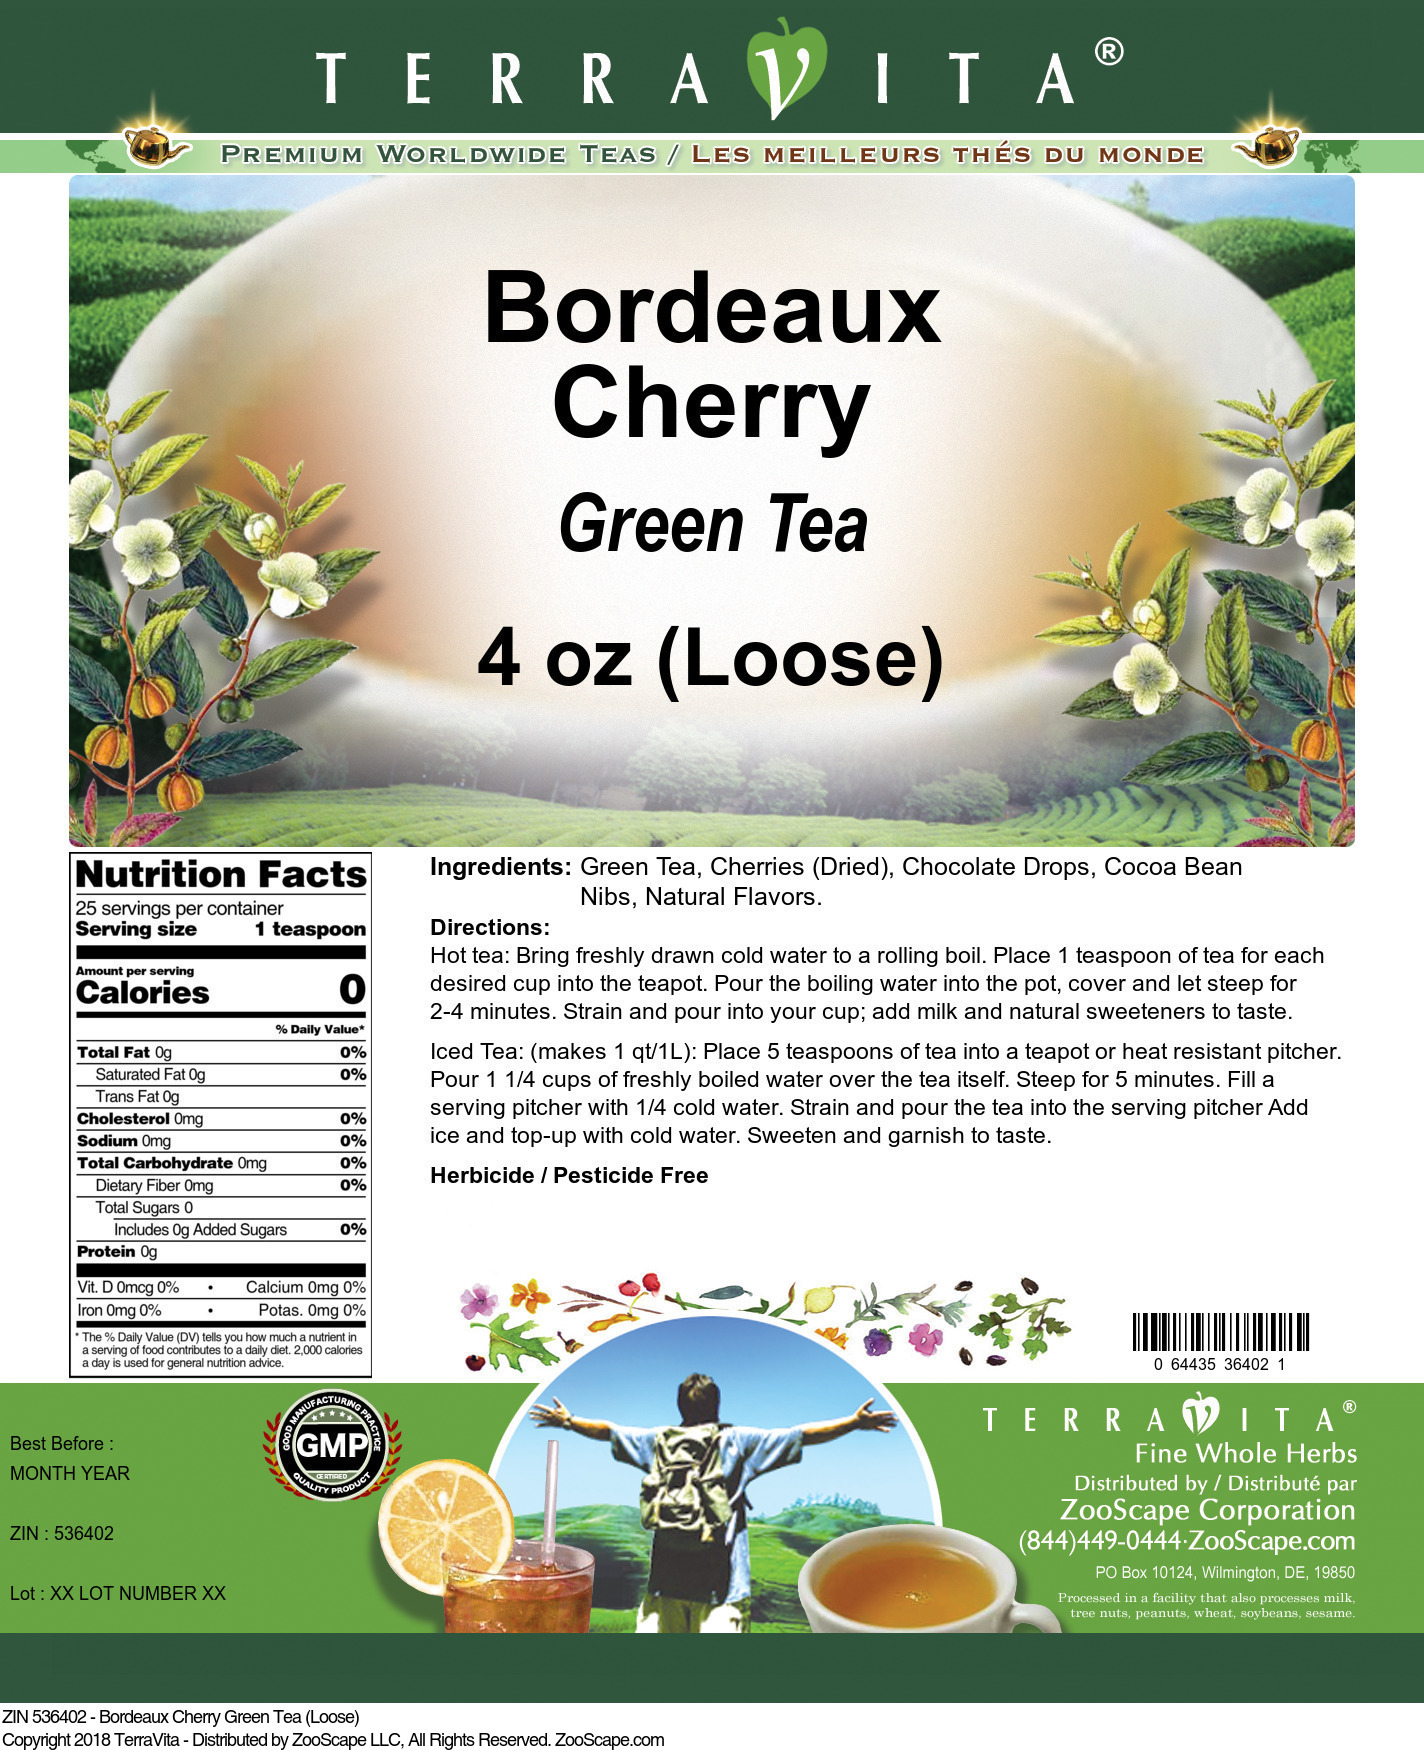 Bordeaux Cherry Green Tea (Loose)